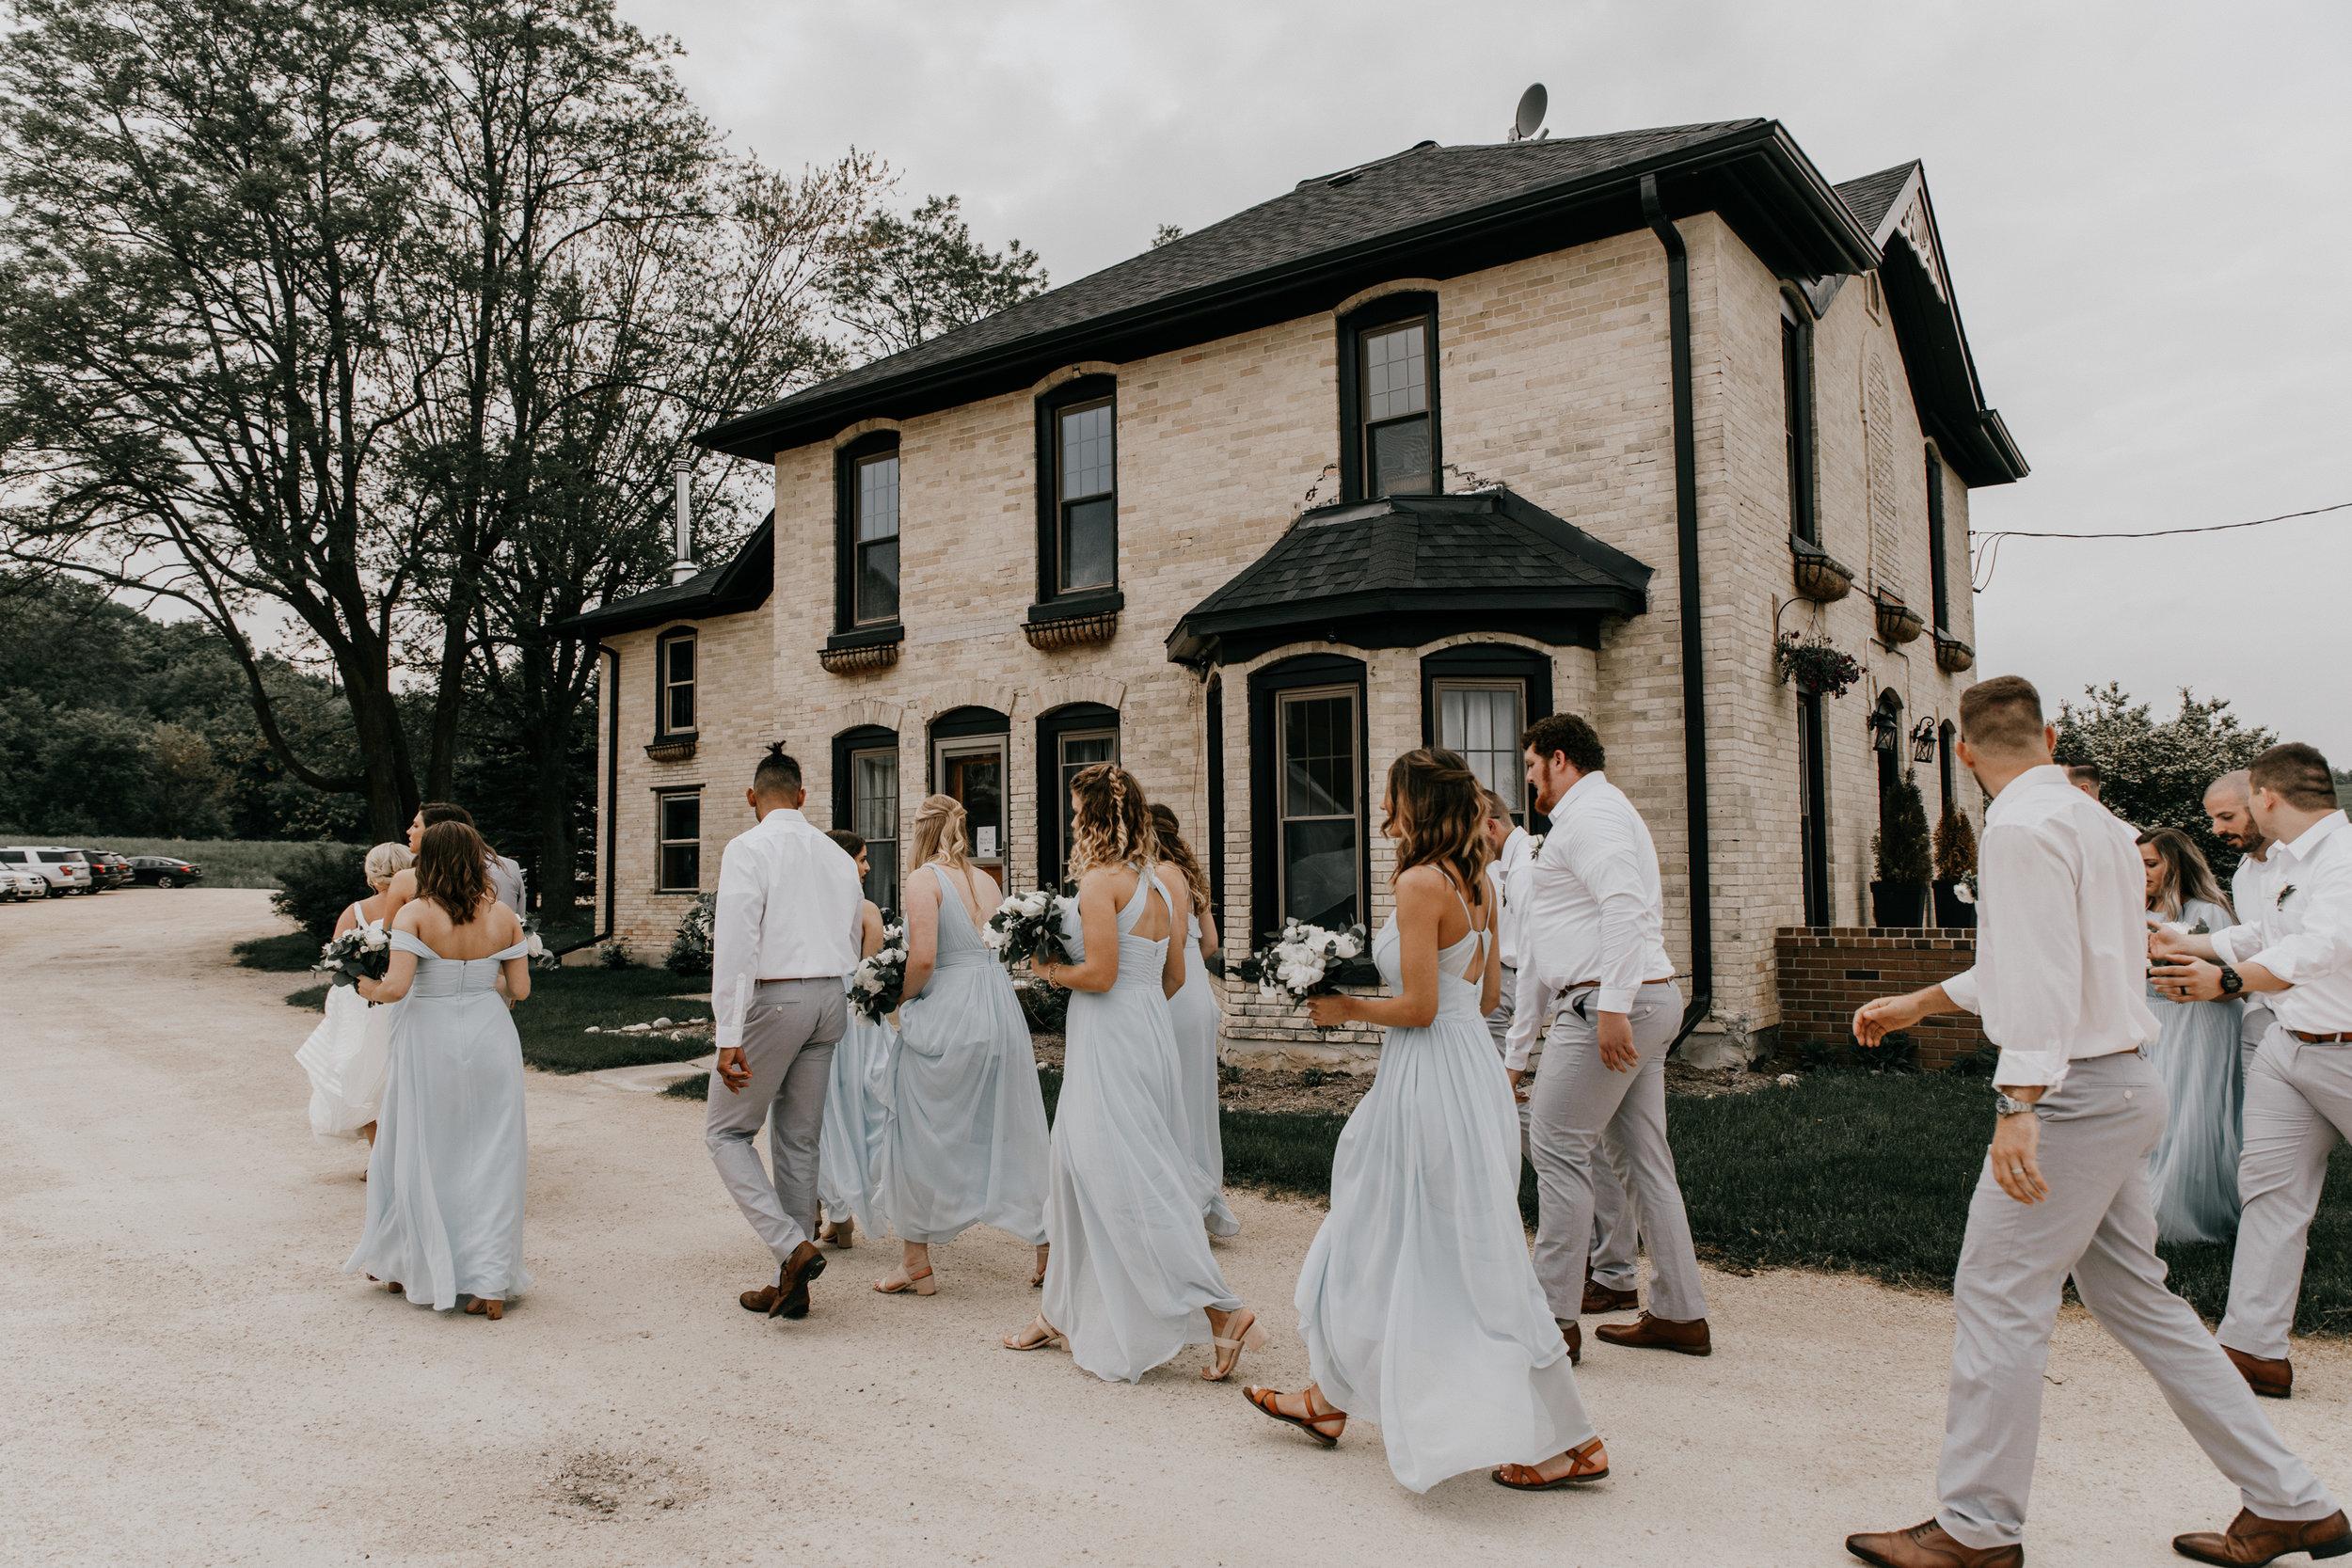 WeddingvideographyCalifornia.jpg